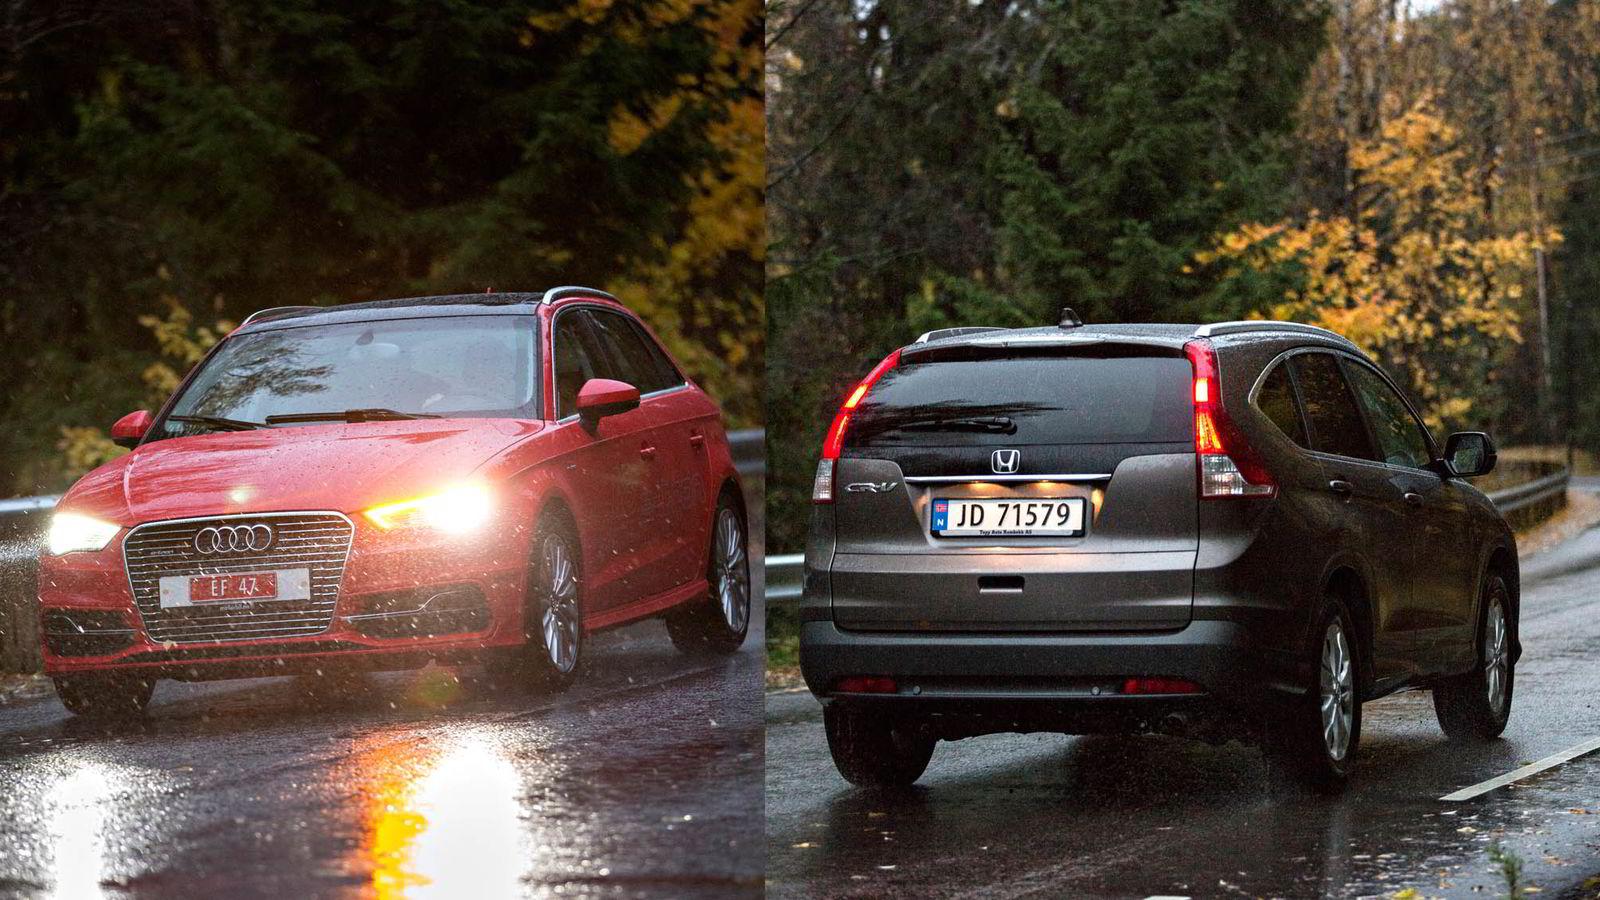 FIRMABILER: Audi A3 Sportback e-tron Skattepris: 402.378,- Måndedesleie: 4243,-. Honda CR-V Skattepris: 401.828,- Måndedesleie: 5204,- Foto: Aleksander Nordahl